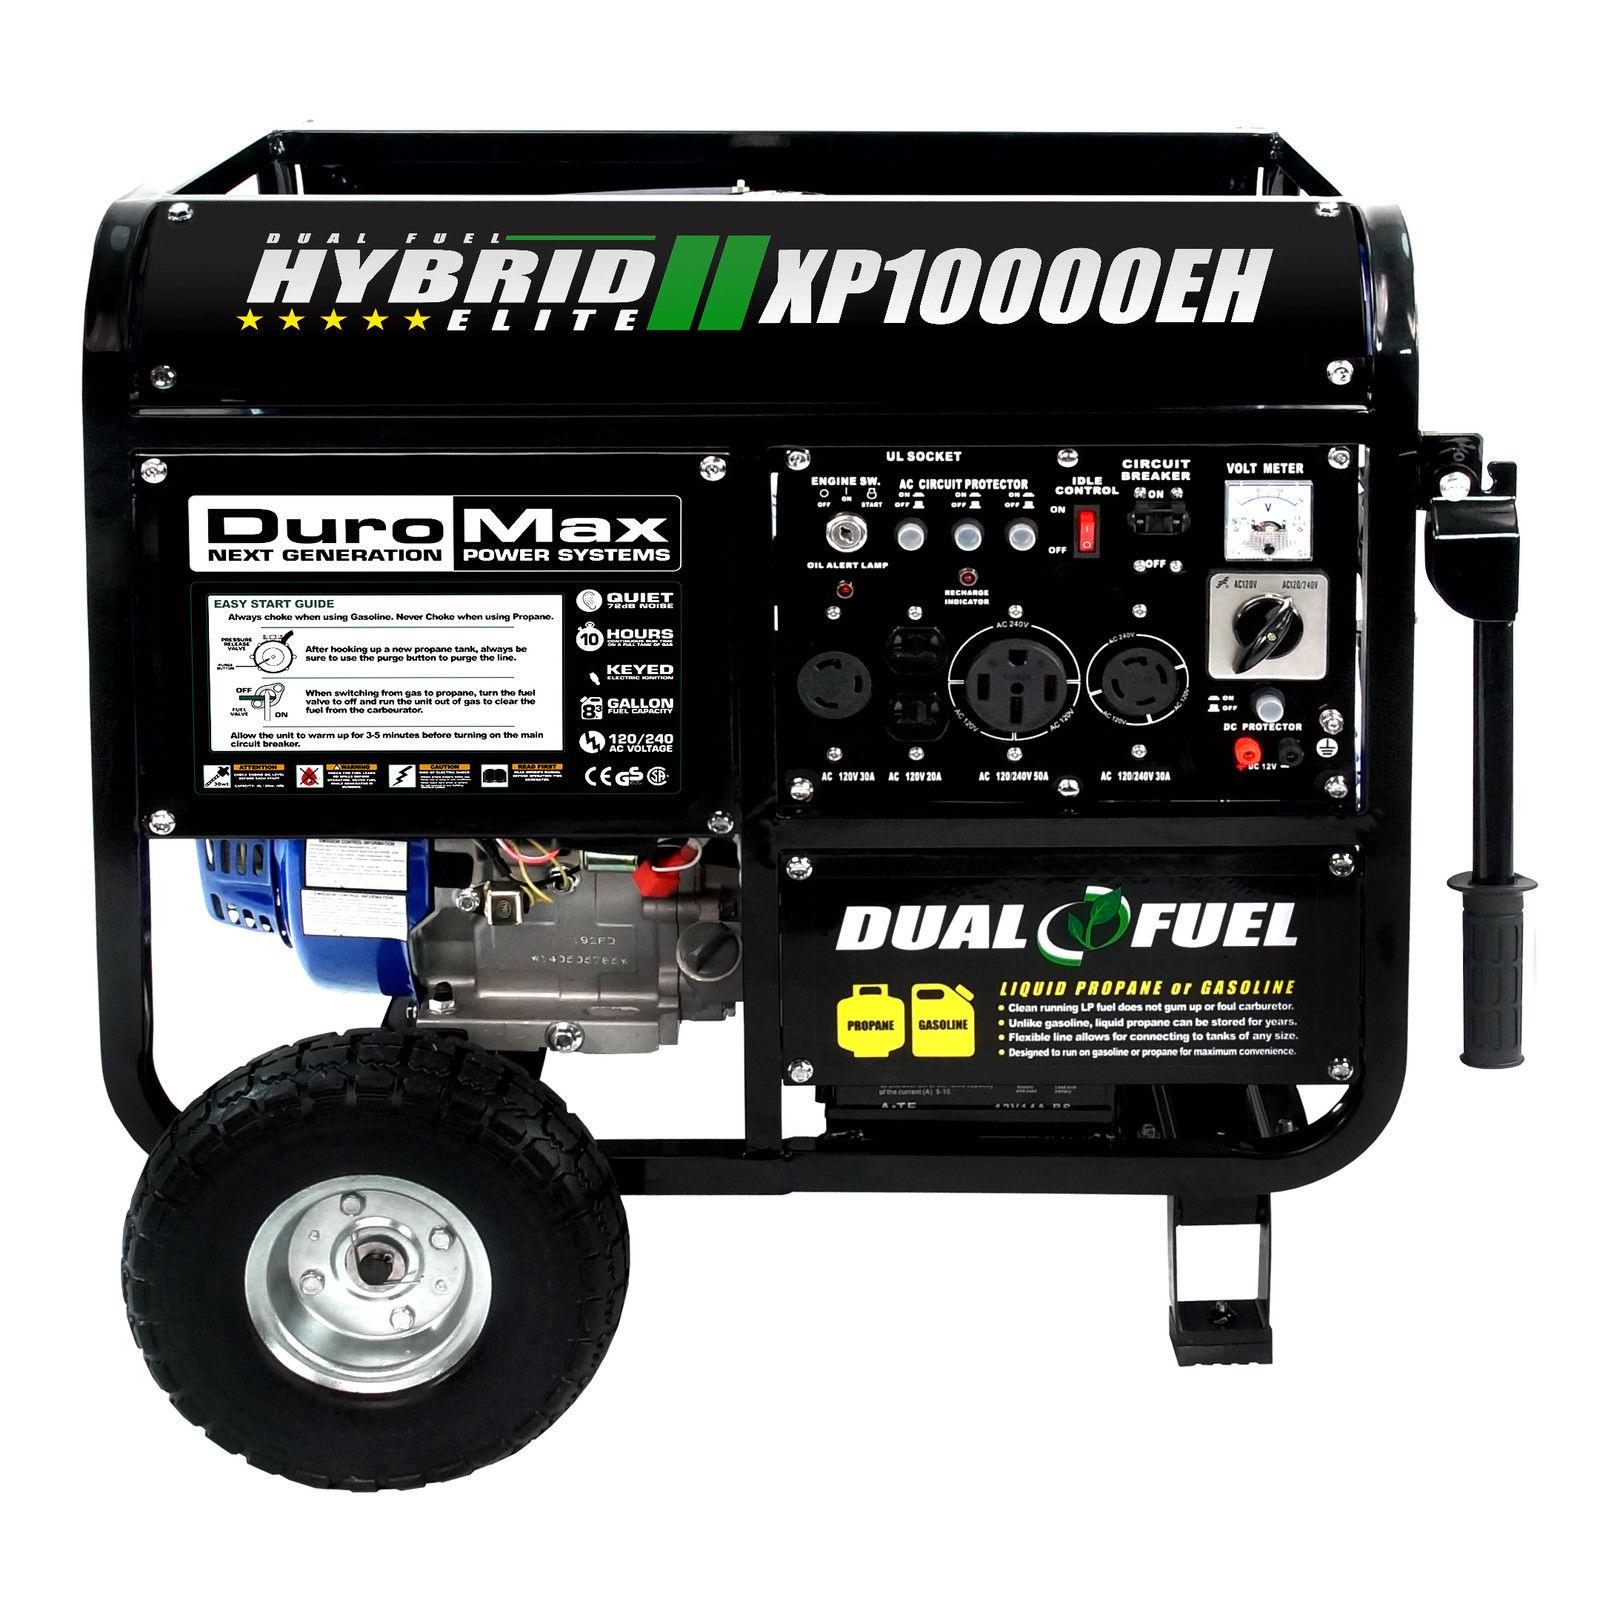 DuroMax XP10000EH Hybrid Portable Dual Fuel Propane / Gas Camping RV Generator - $599.99 + Free Shipping @ ebay.com